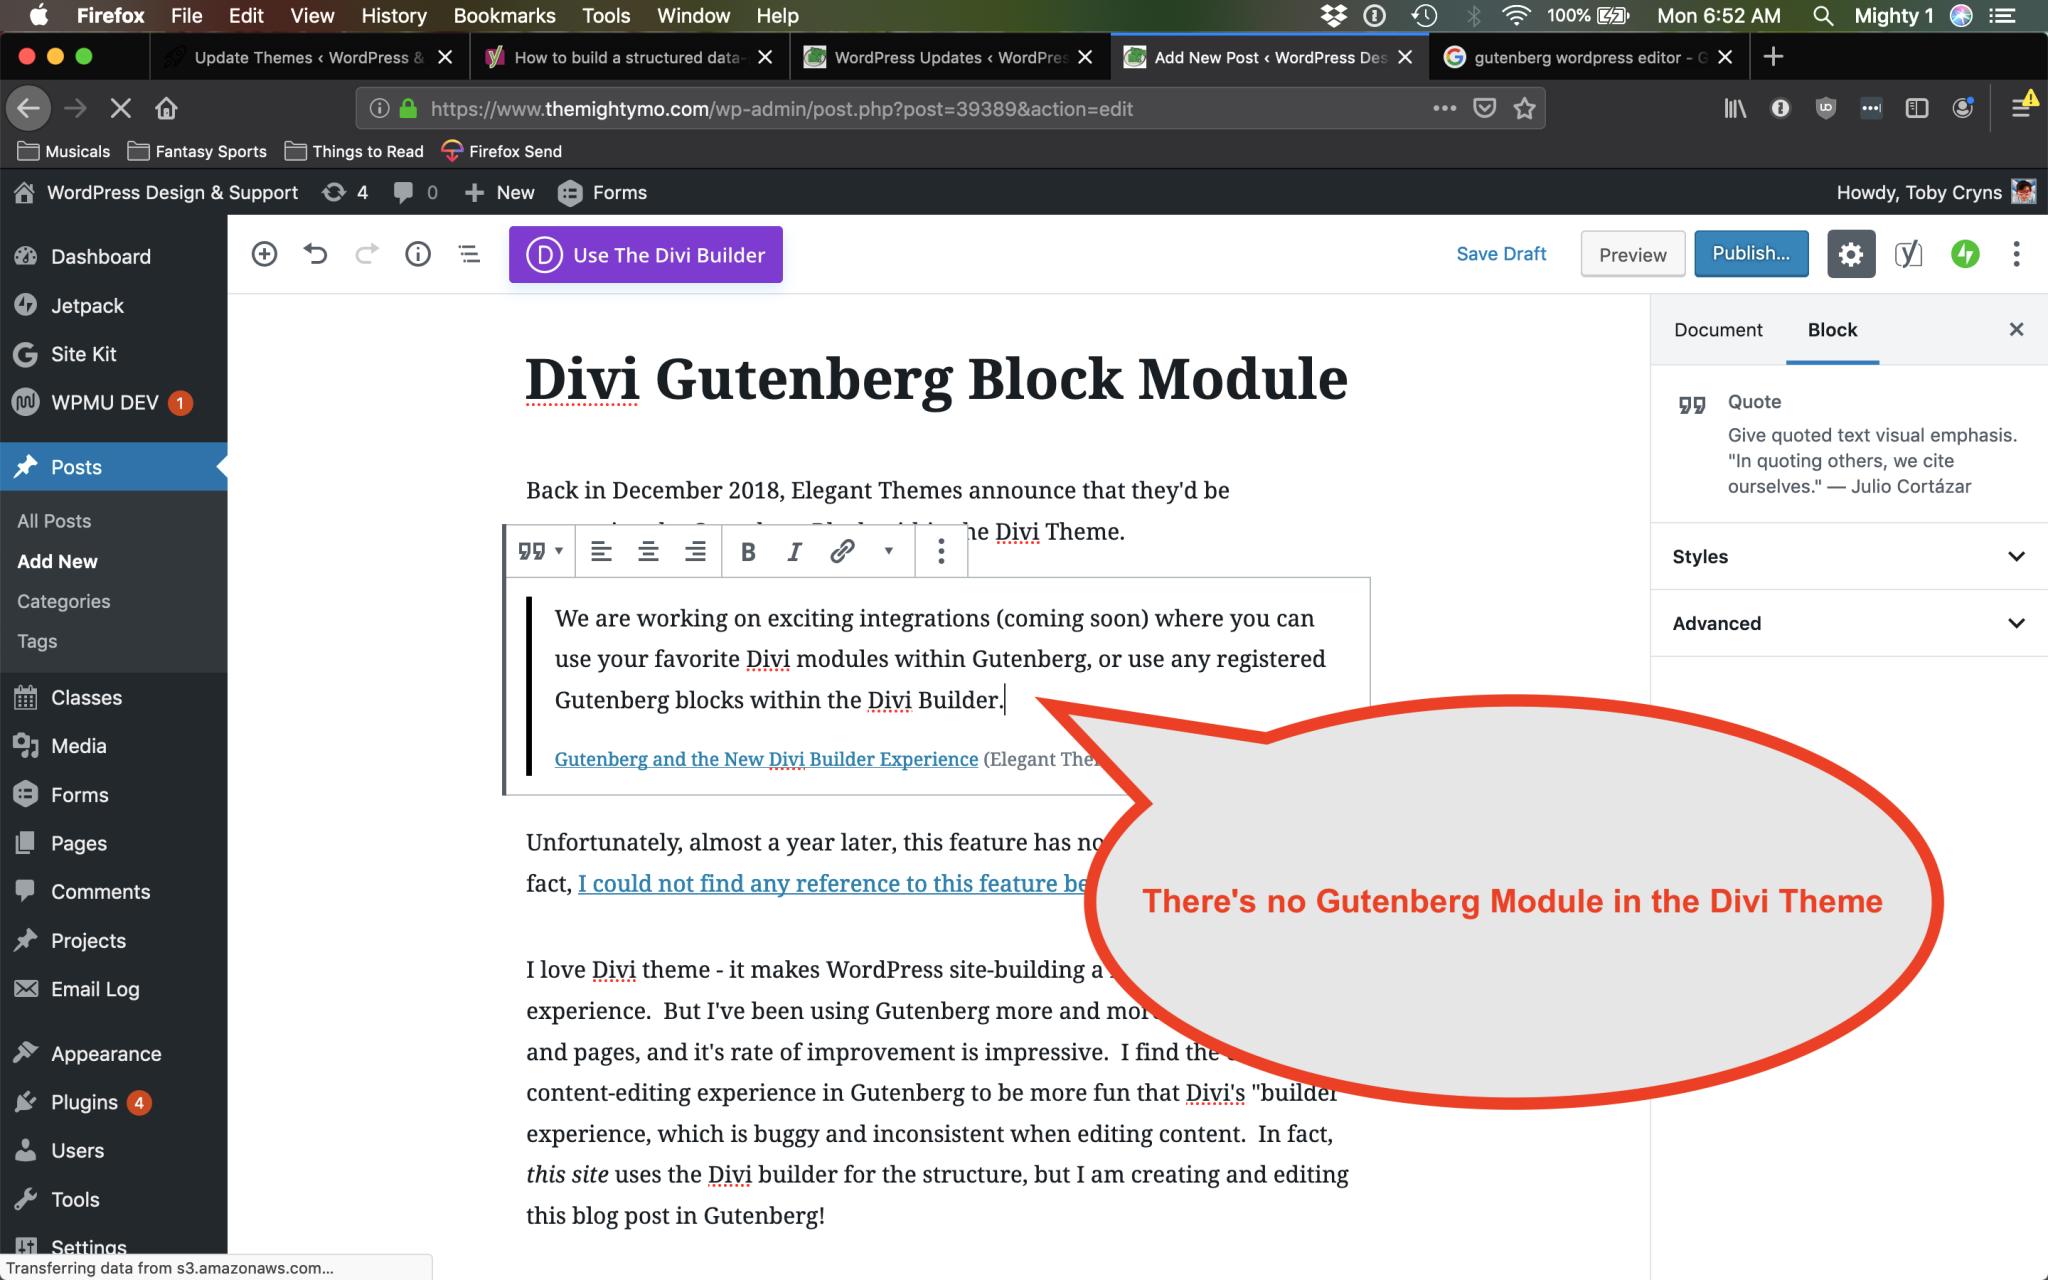 divi gutenberg module